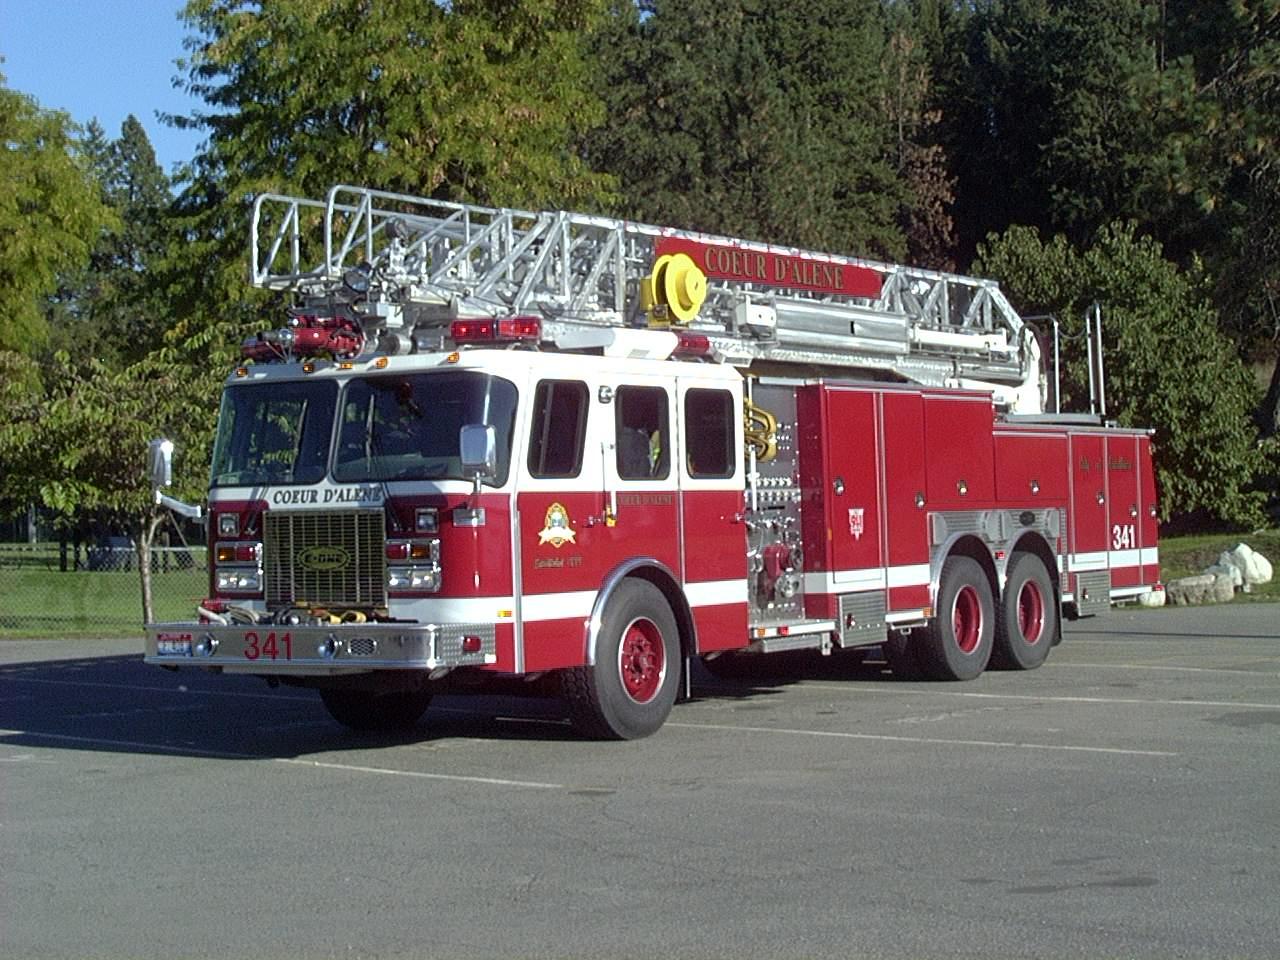 Dave Smith Motors Cda Idaho >> Department Of Motor Vehicles Coeur D Alene Idaho - impremedia.net